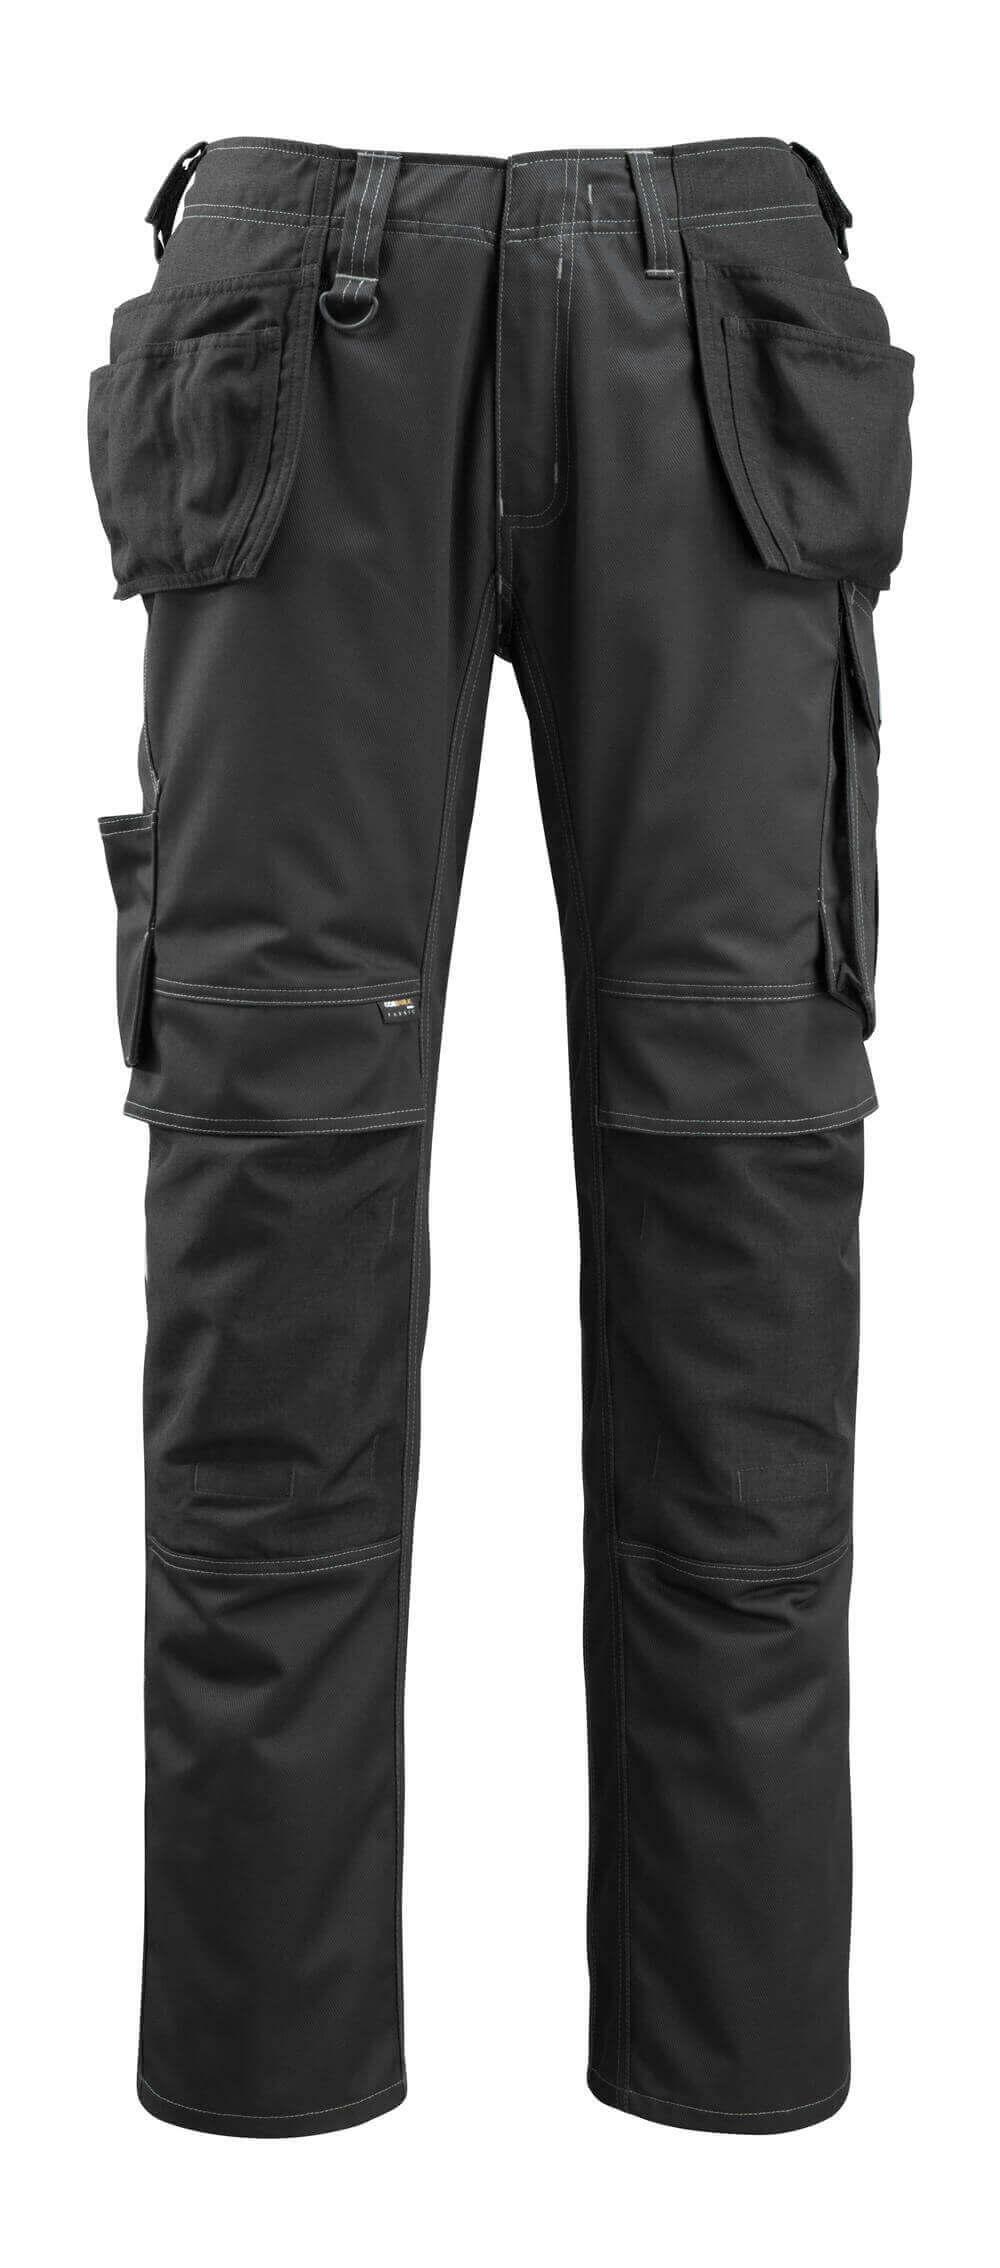 14131-203-09 Pantalones con bolsillos tipo funda - negro